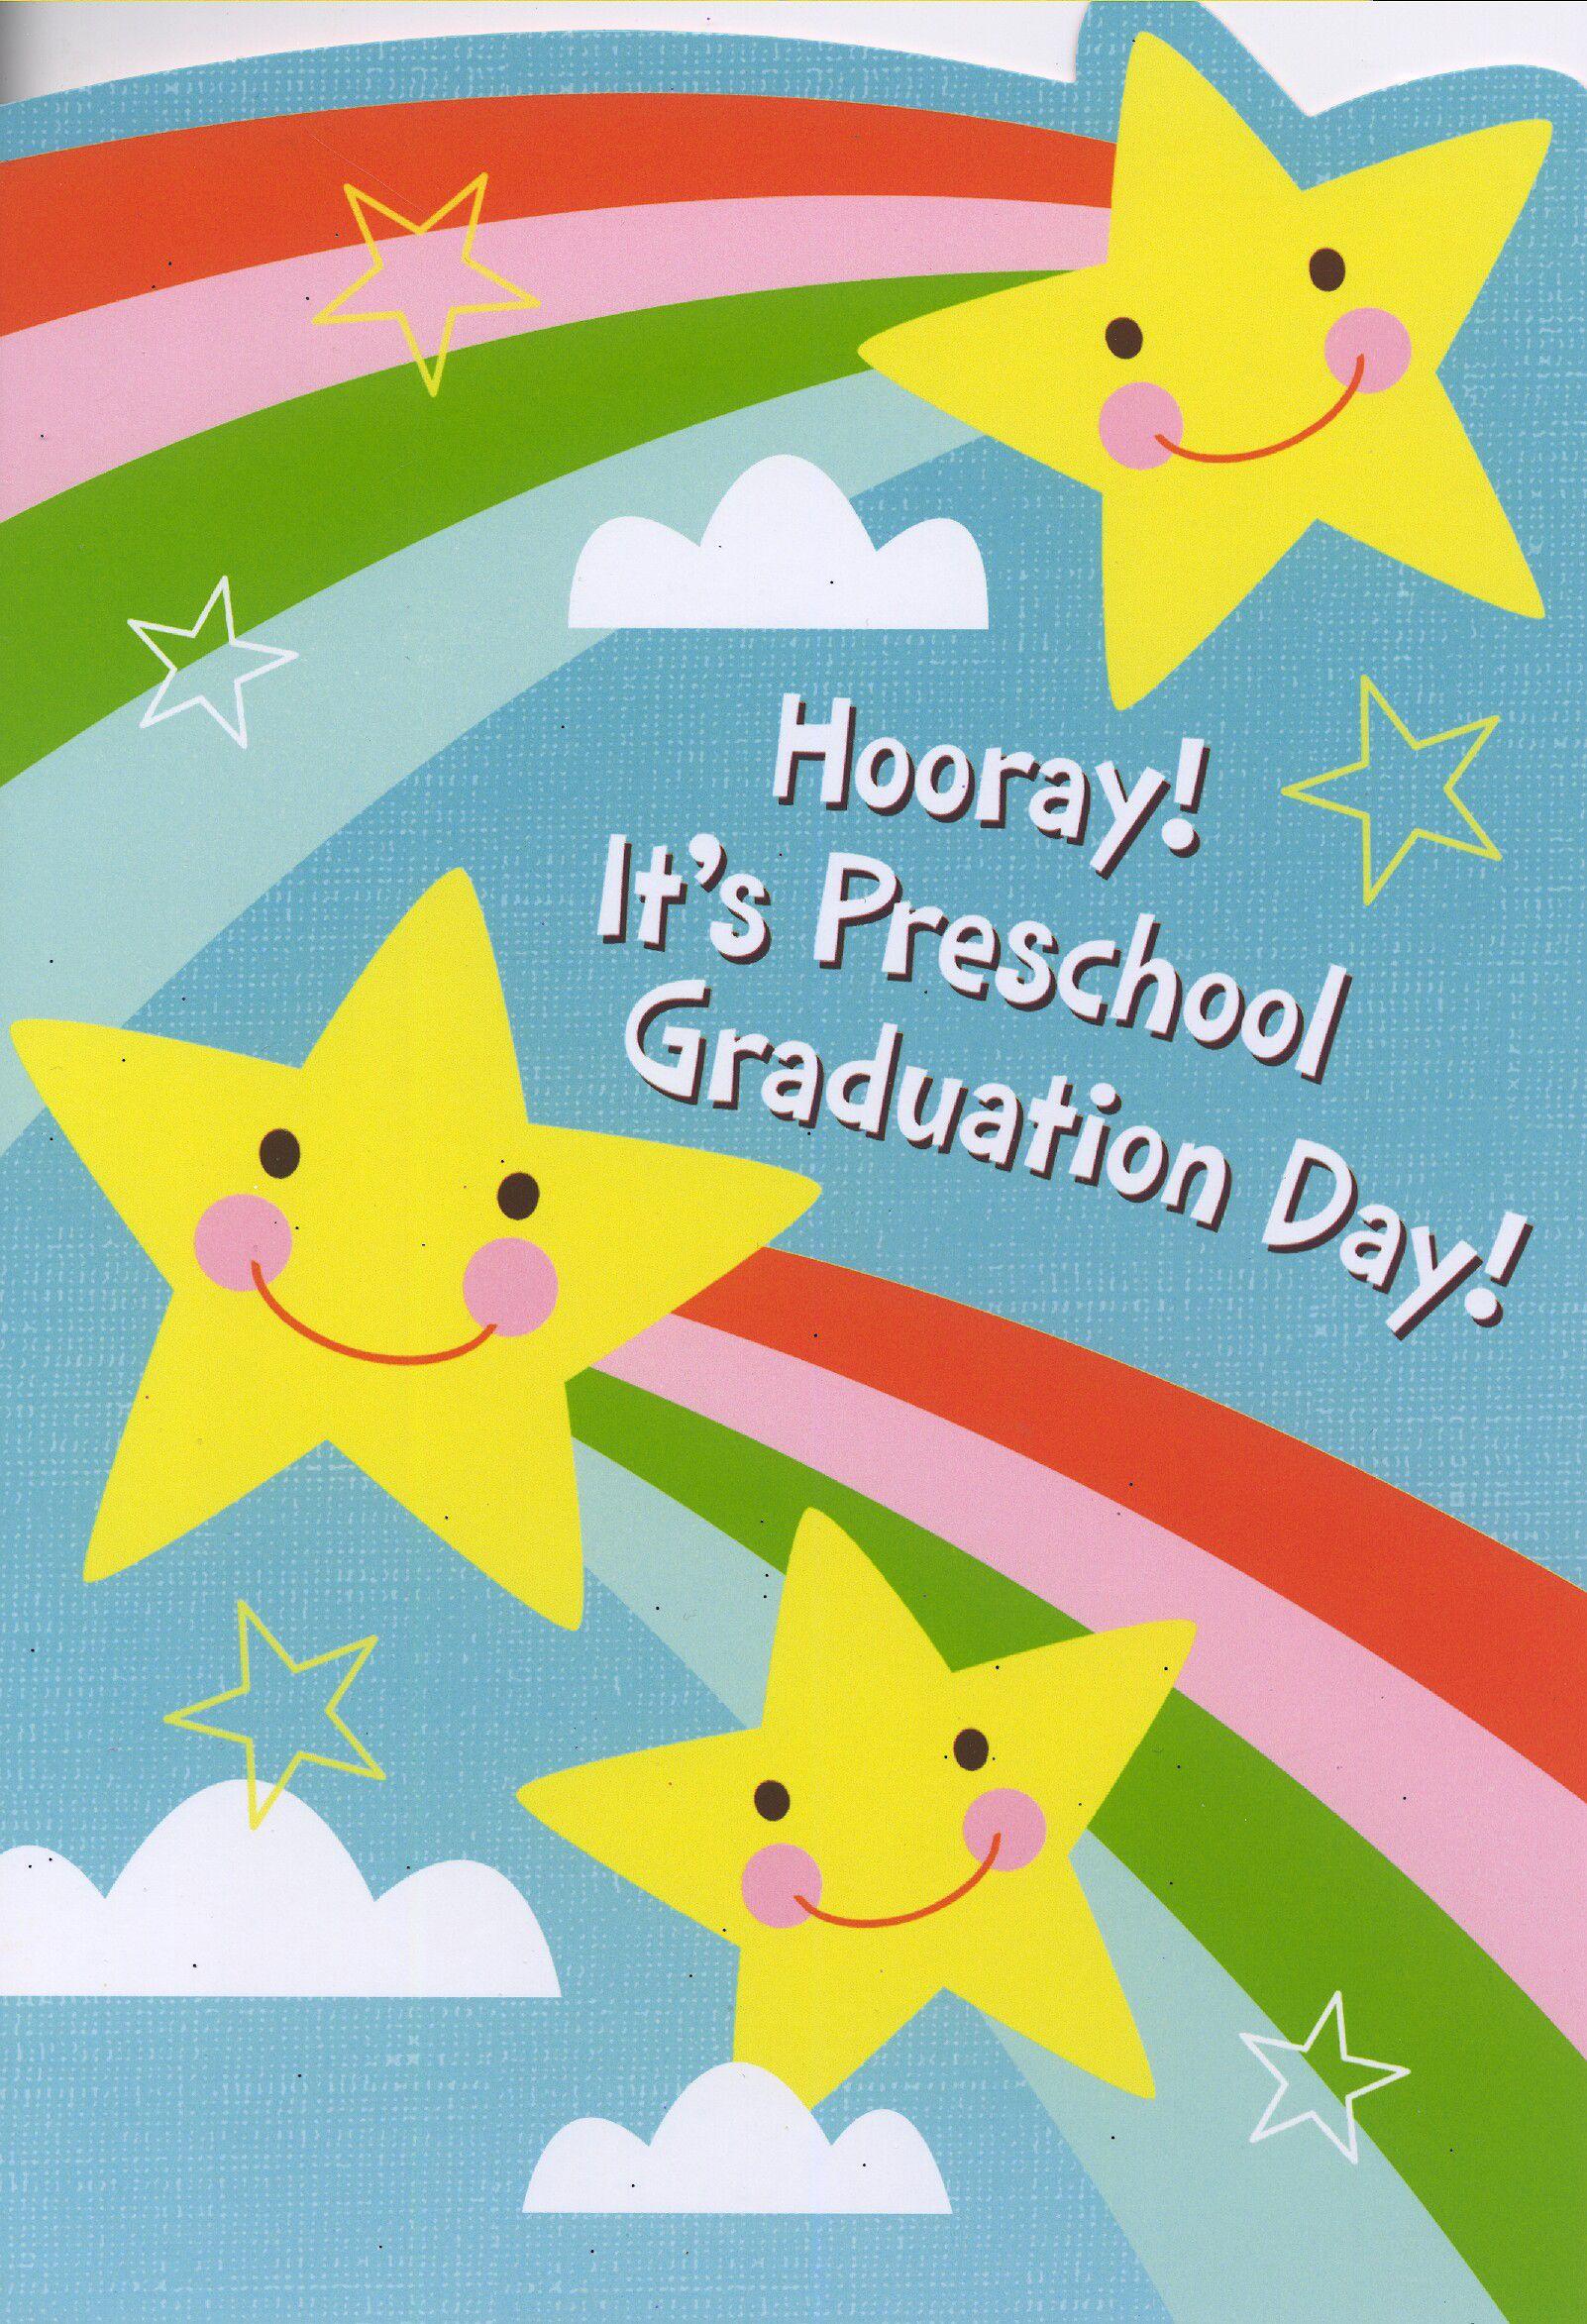 Hallmark Has Cards To Celebrate And Congratulate Graduates